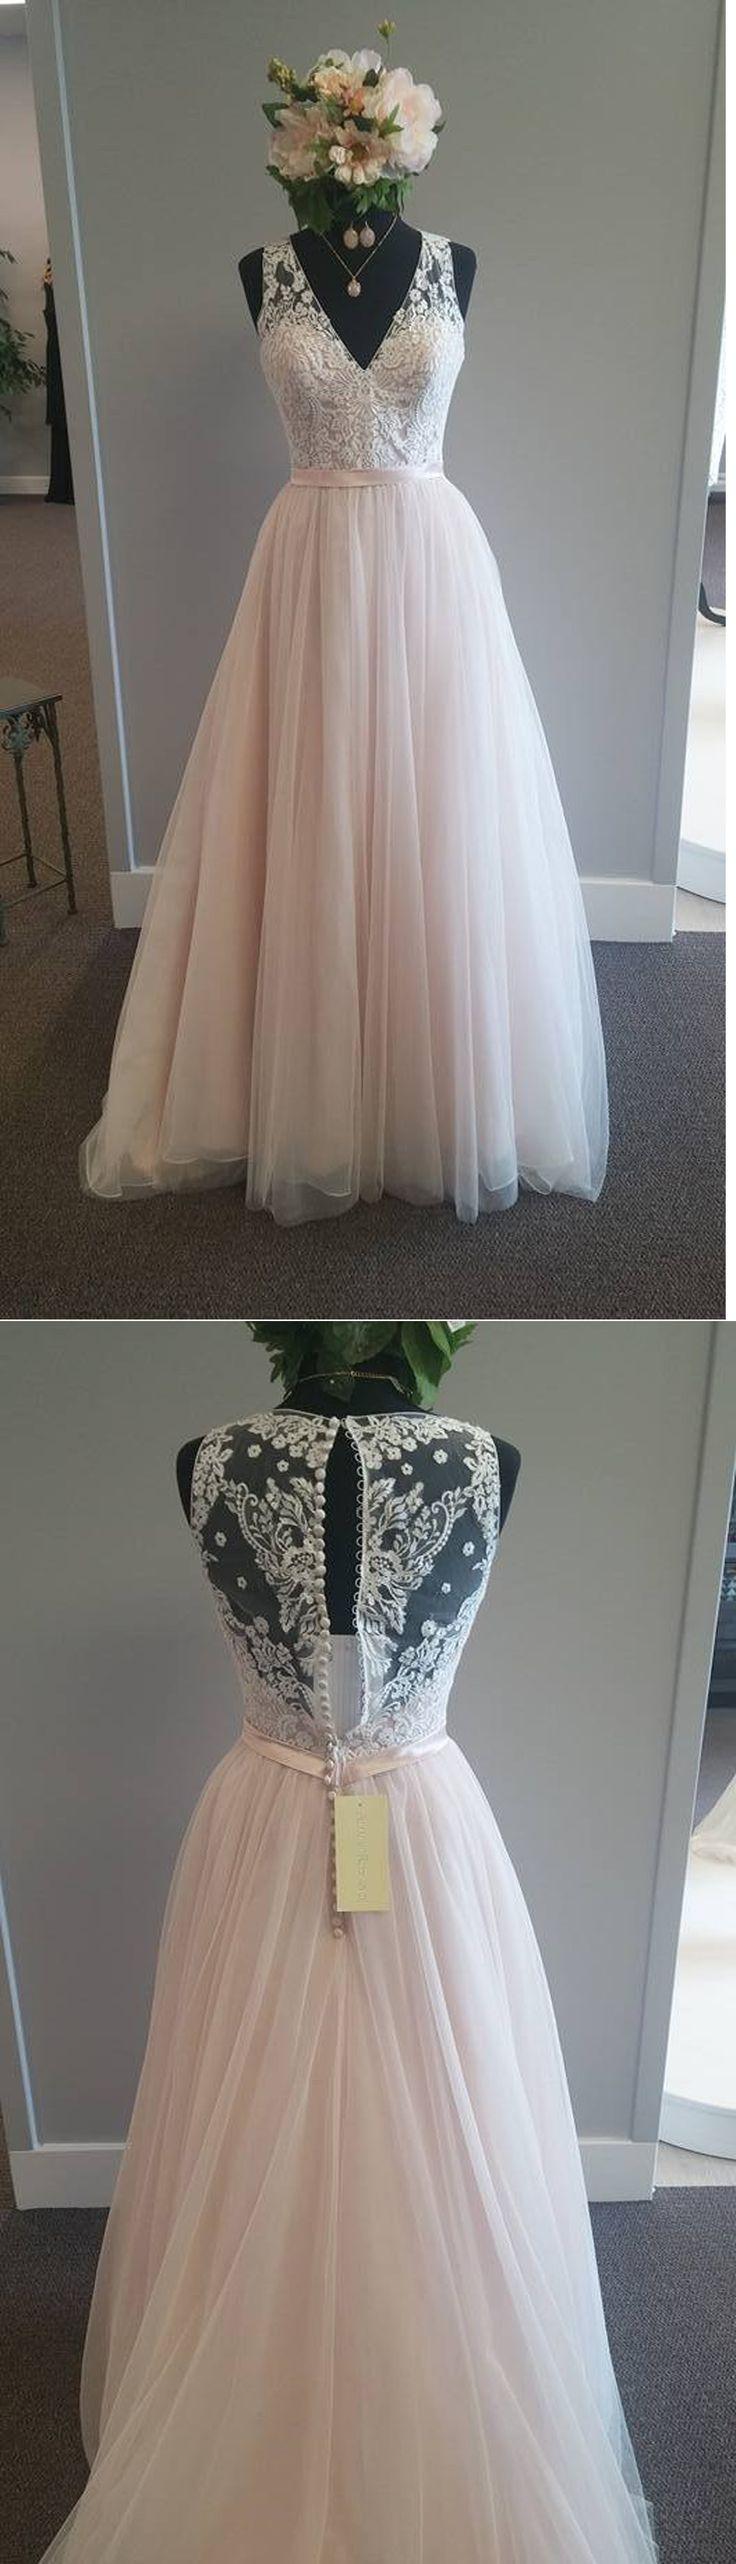 A-line Wedding Dresses,Elegant Wedding Gown,Light Pink Wedding Dresses,V-neck Bridal Gowns,See Through Wedding Dresses,Plus Size Wedding Dress,Wedding Dresses,SUE78